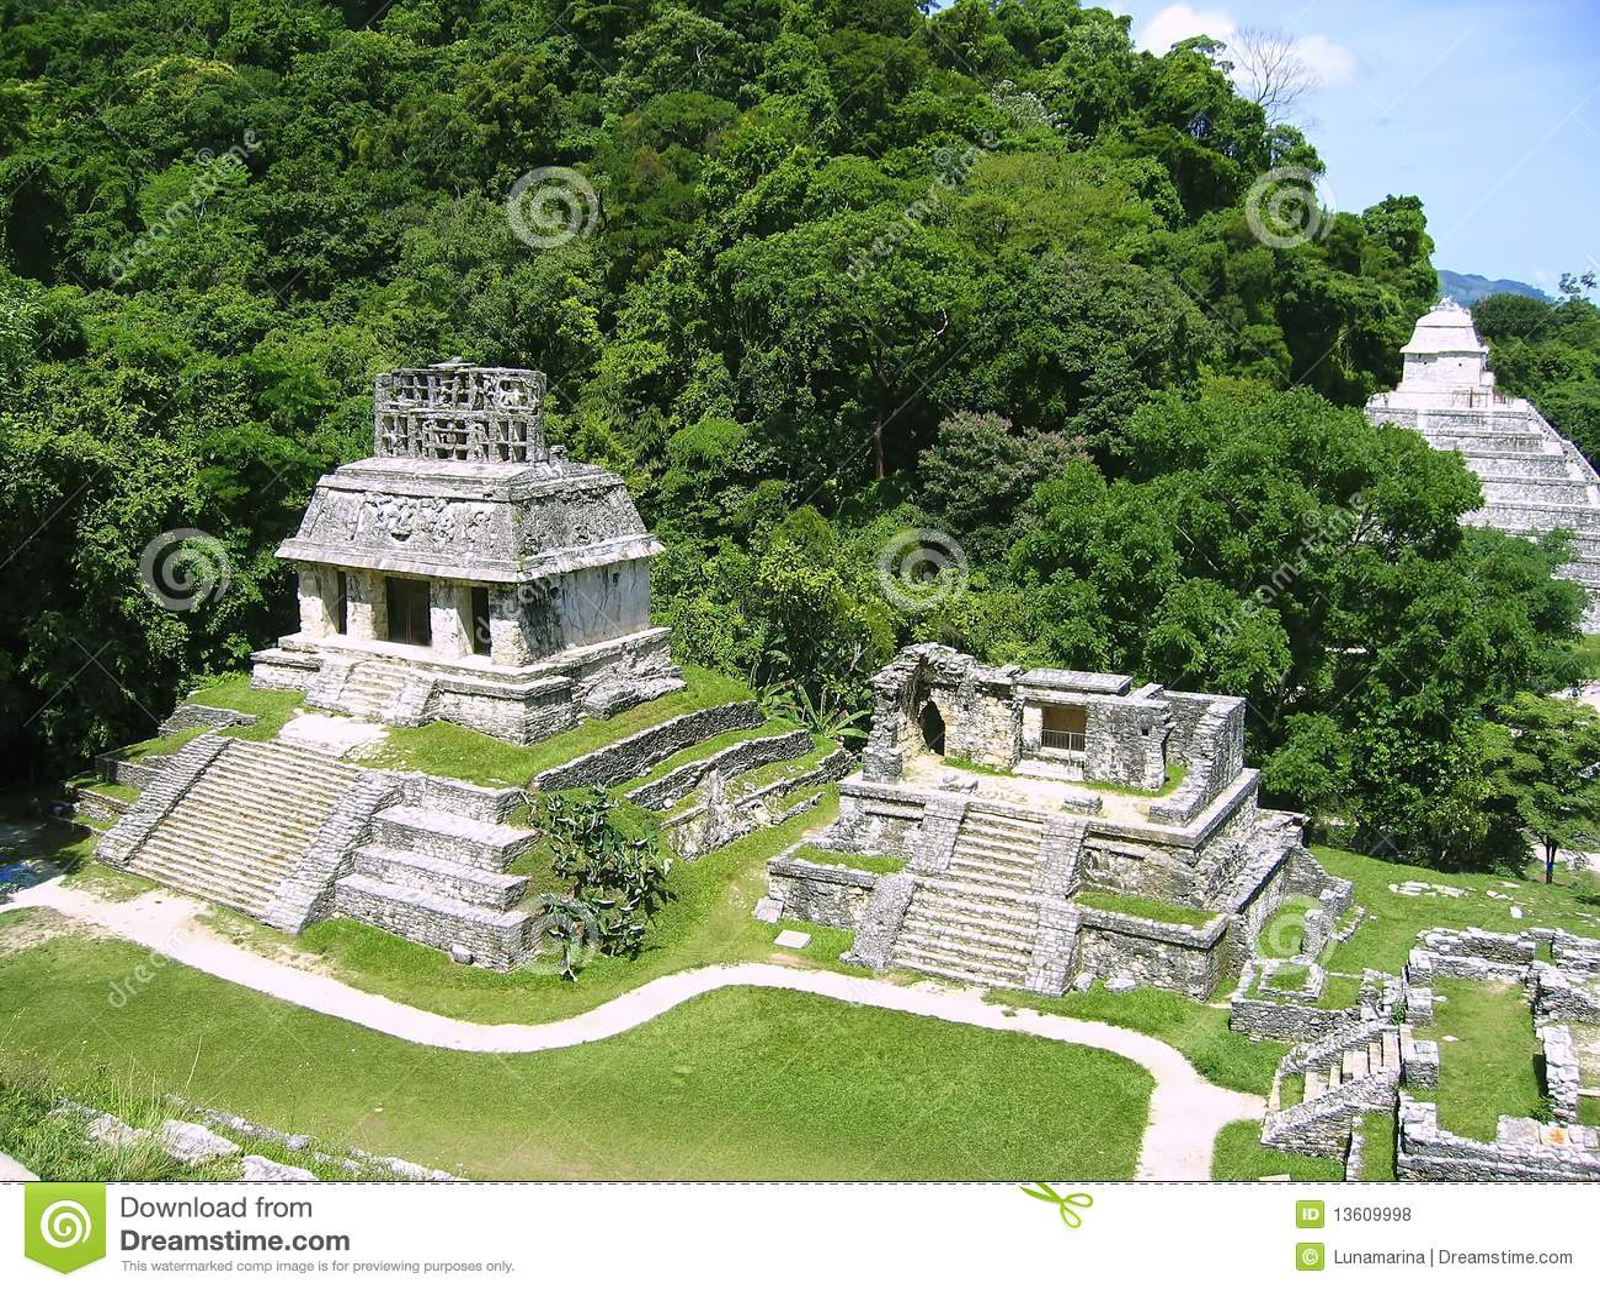 Chiapas majowia majskie Mexico palenque ruiny